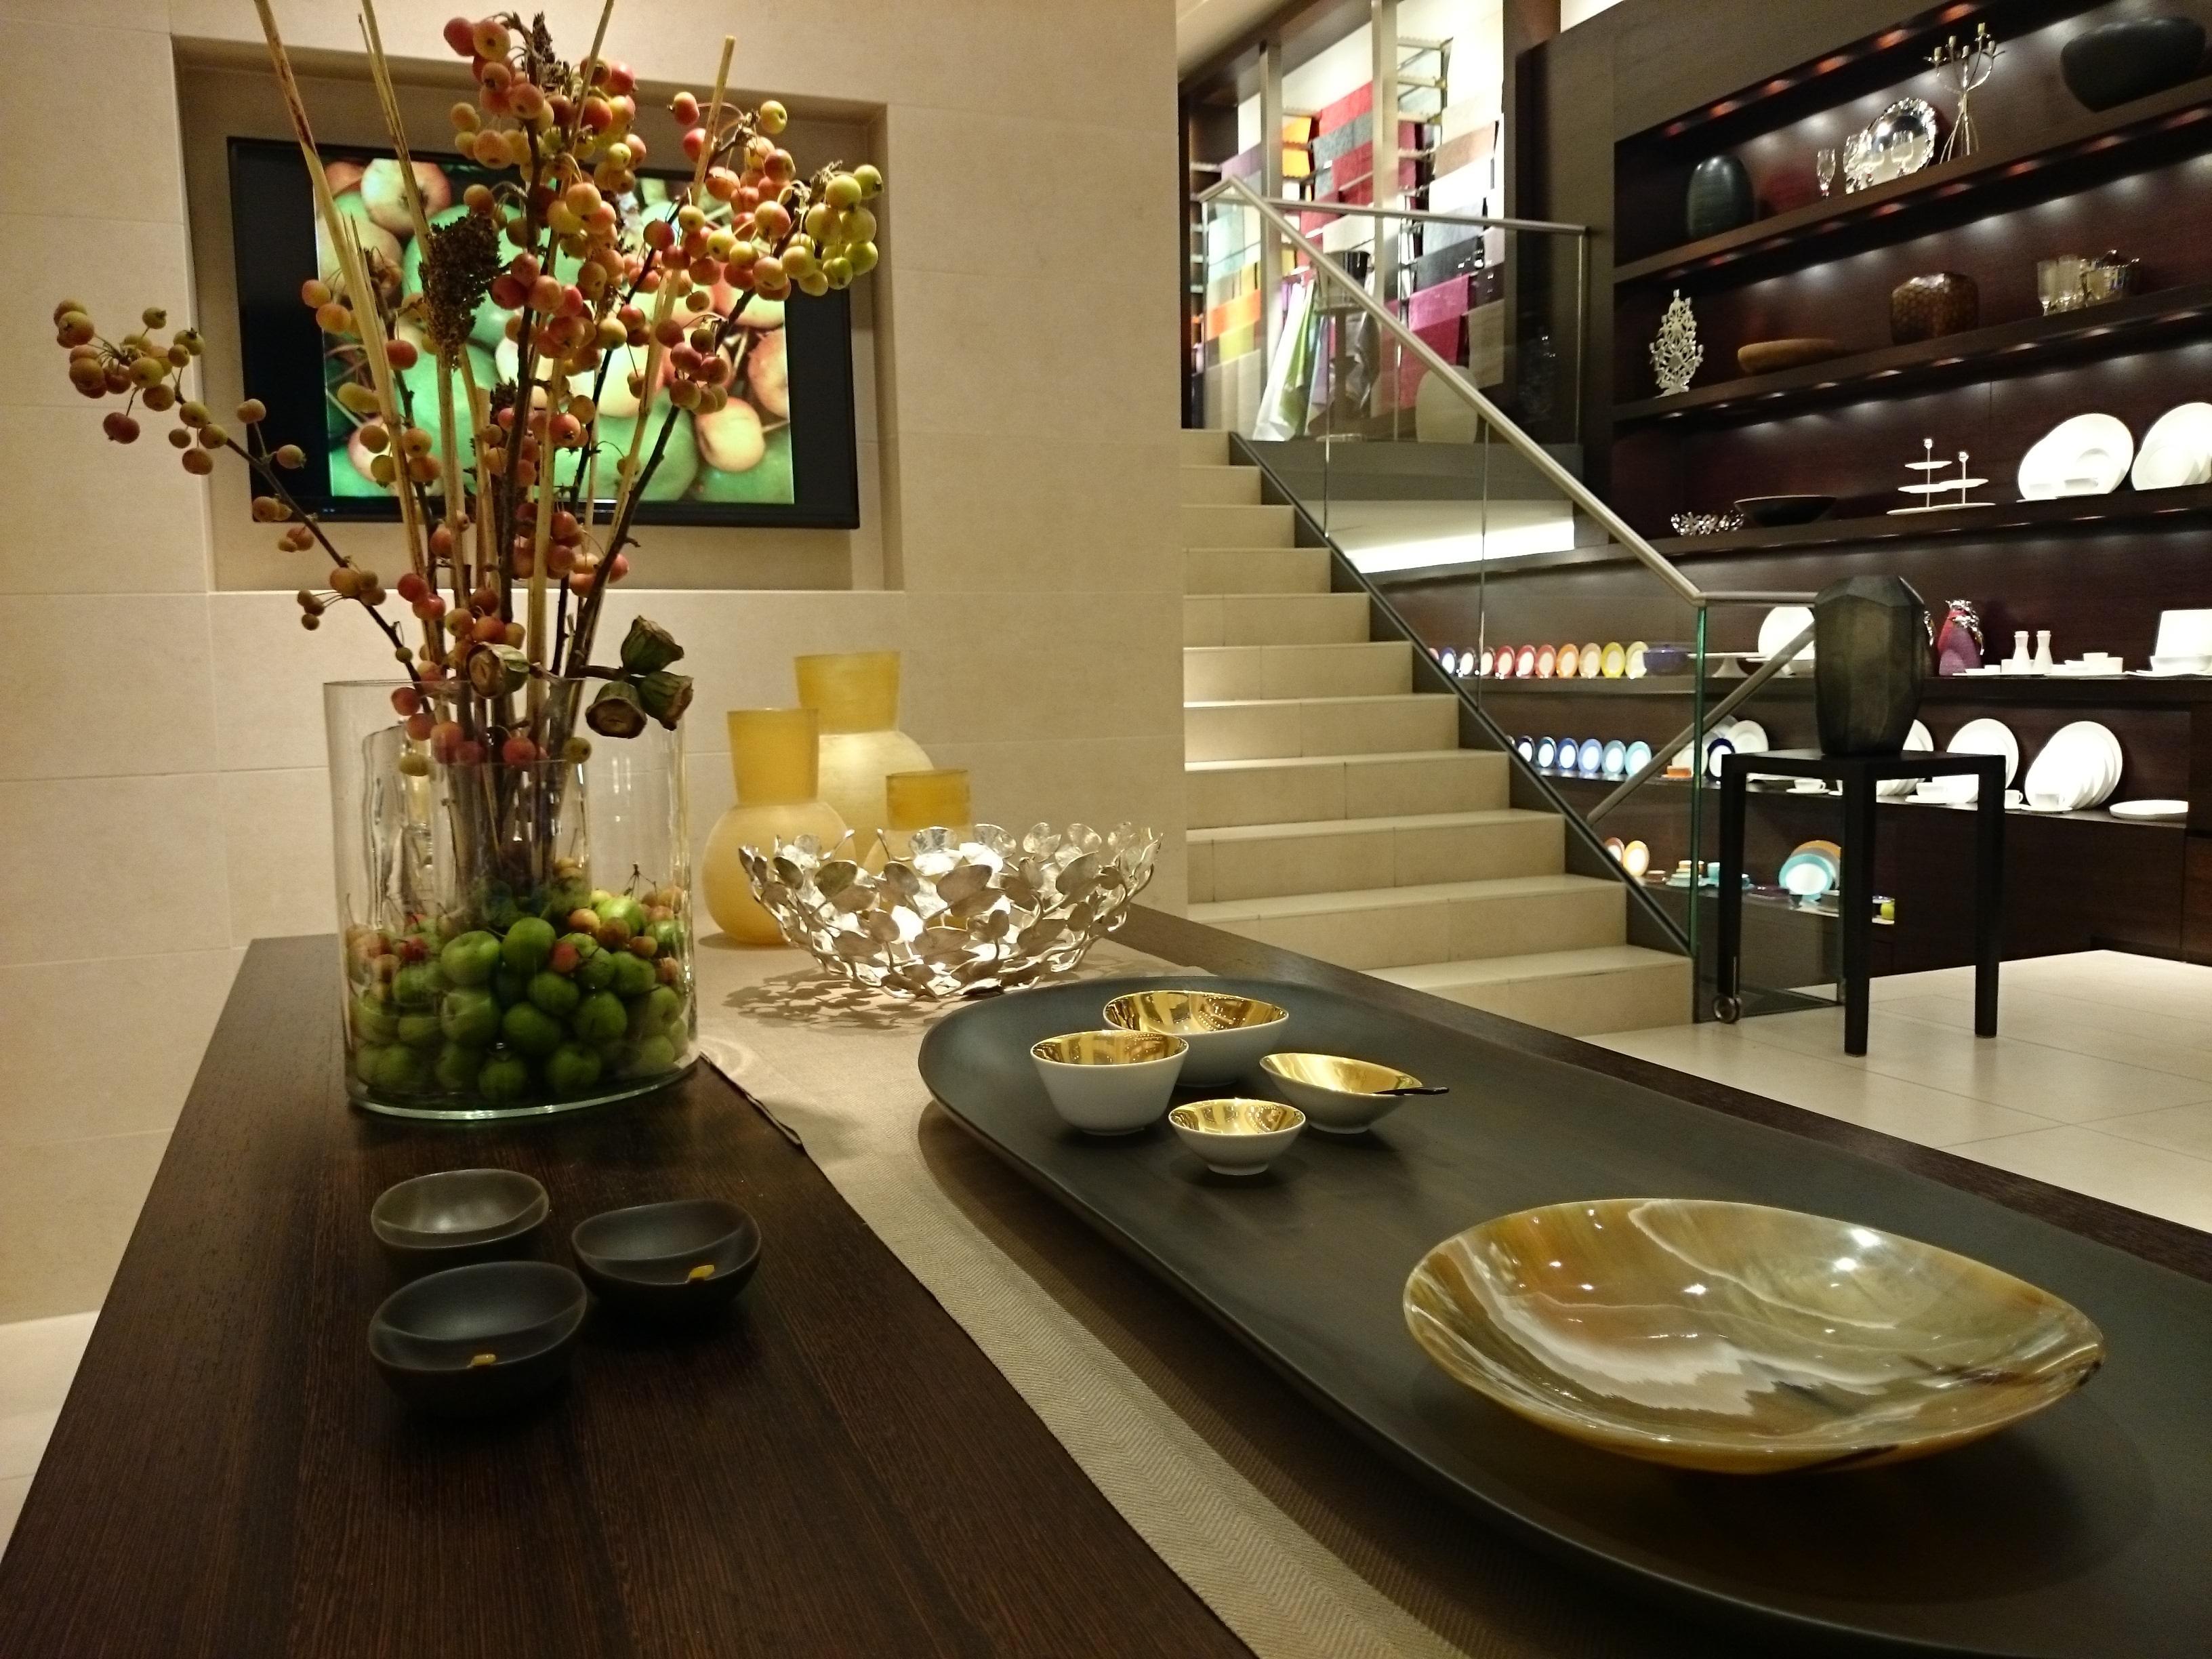 decoration repas italien. Black Bedroom Furniture Sets. Home Design Ideas